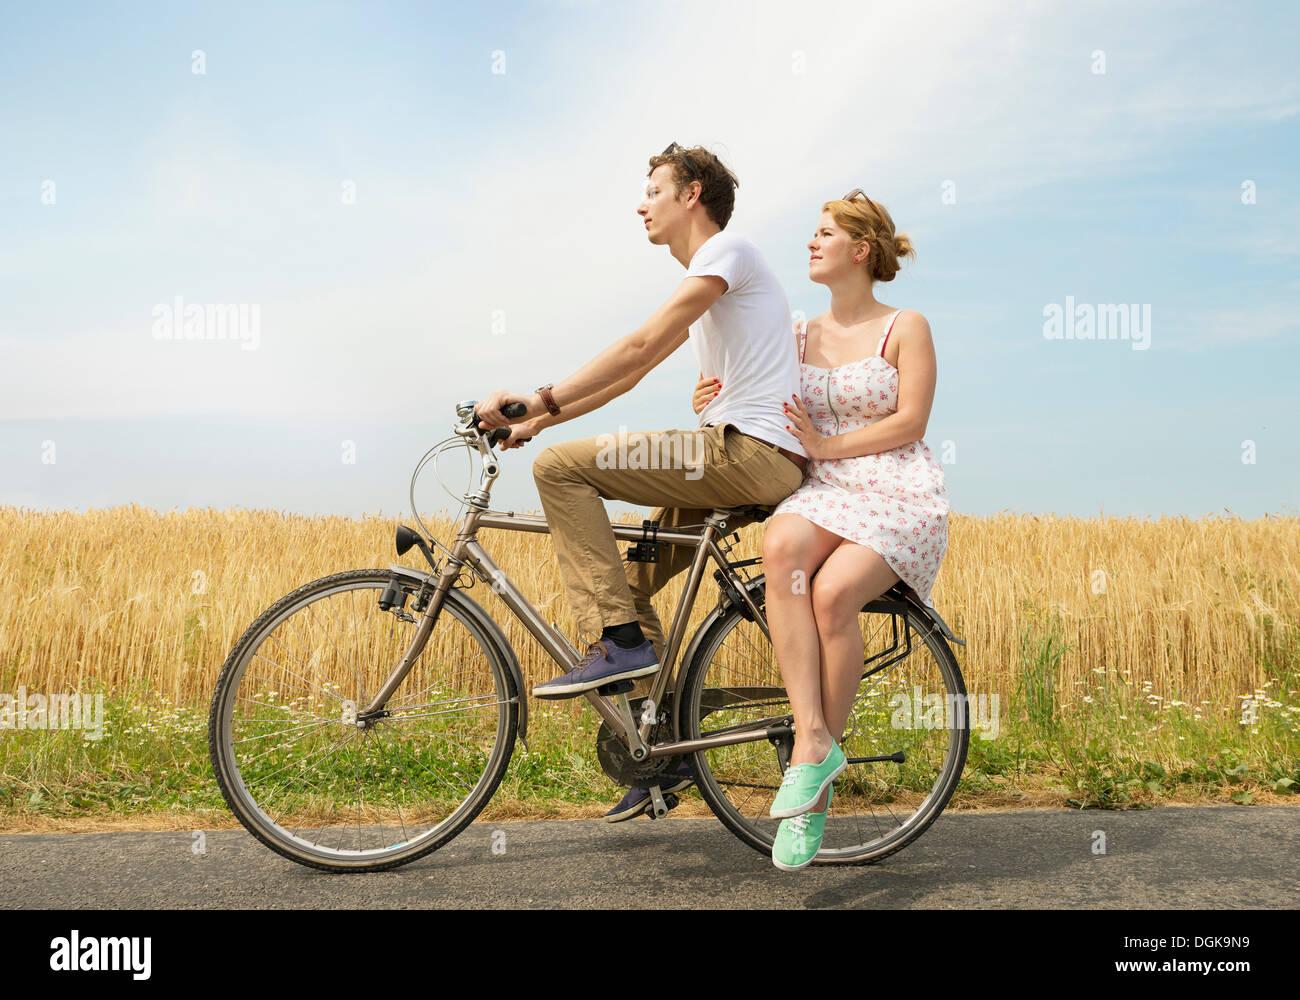 Couple riding bicycle Photo Stock